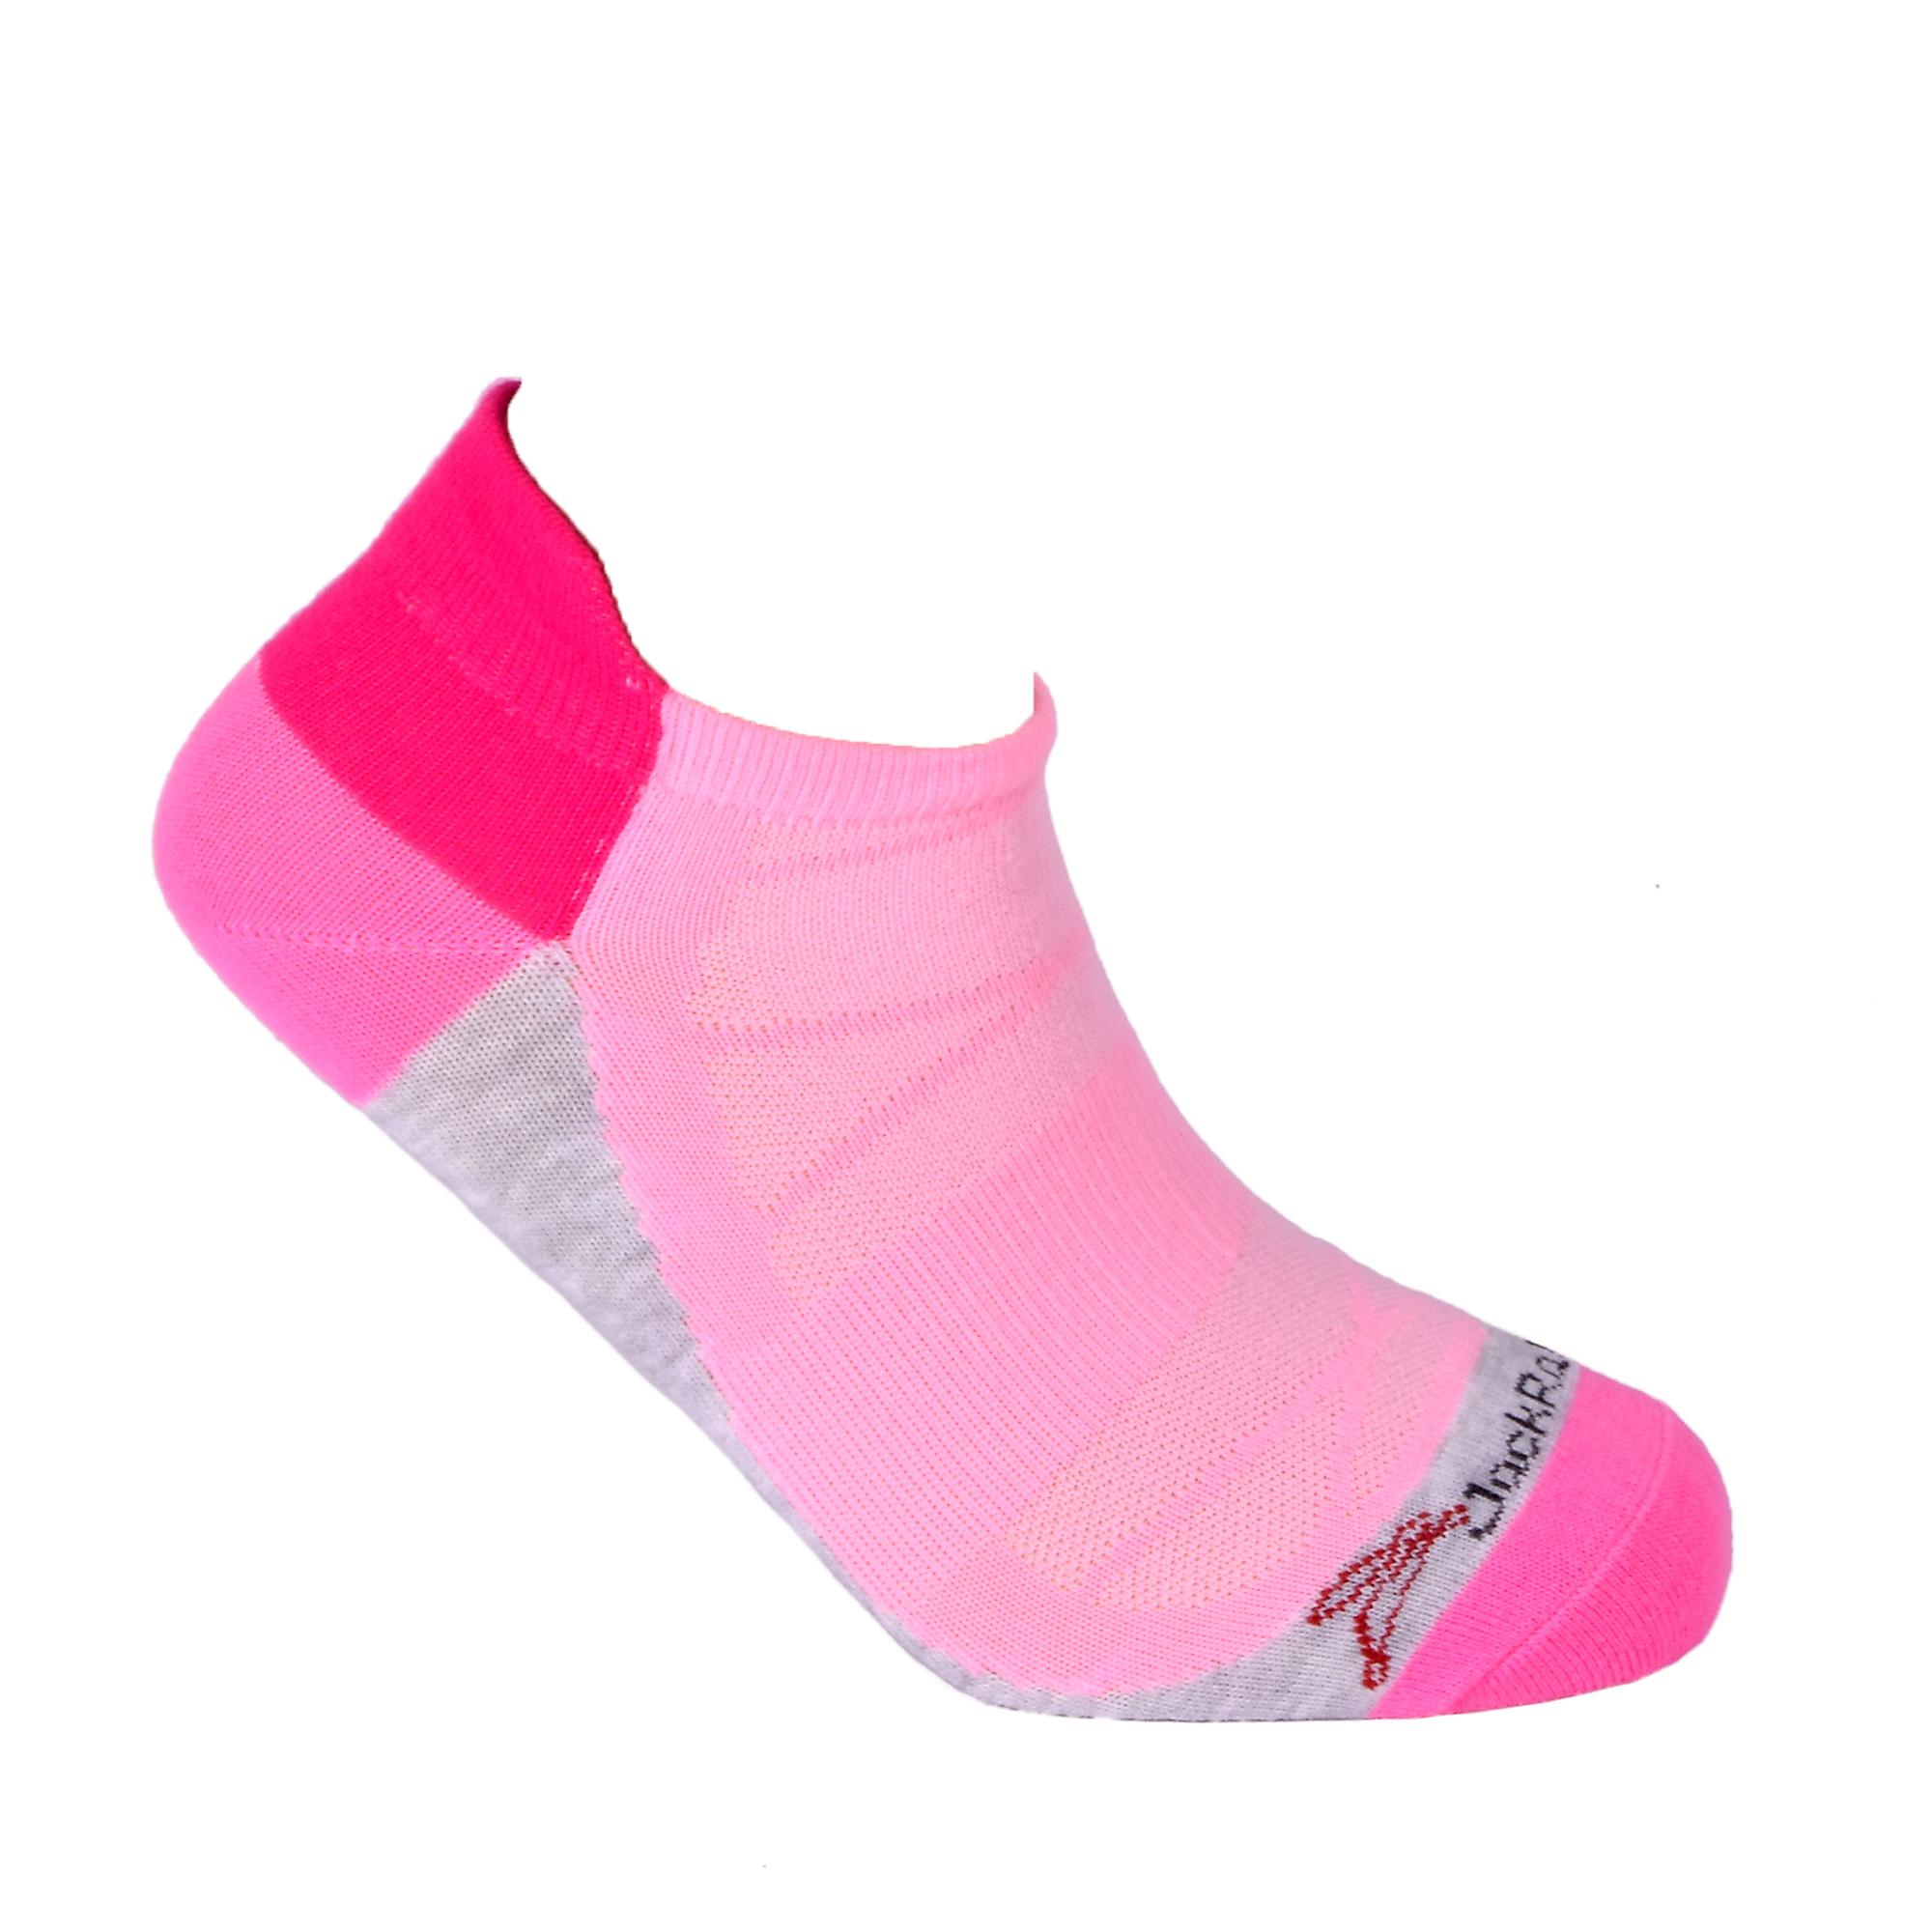 JackRabbit No Show Tab Lite Performance Running Sock - Color: Pink - Size: S, Pink, large, image 3